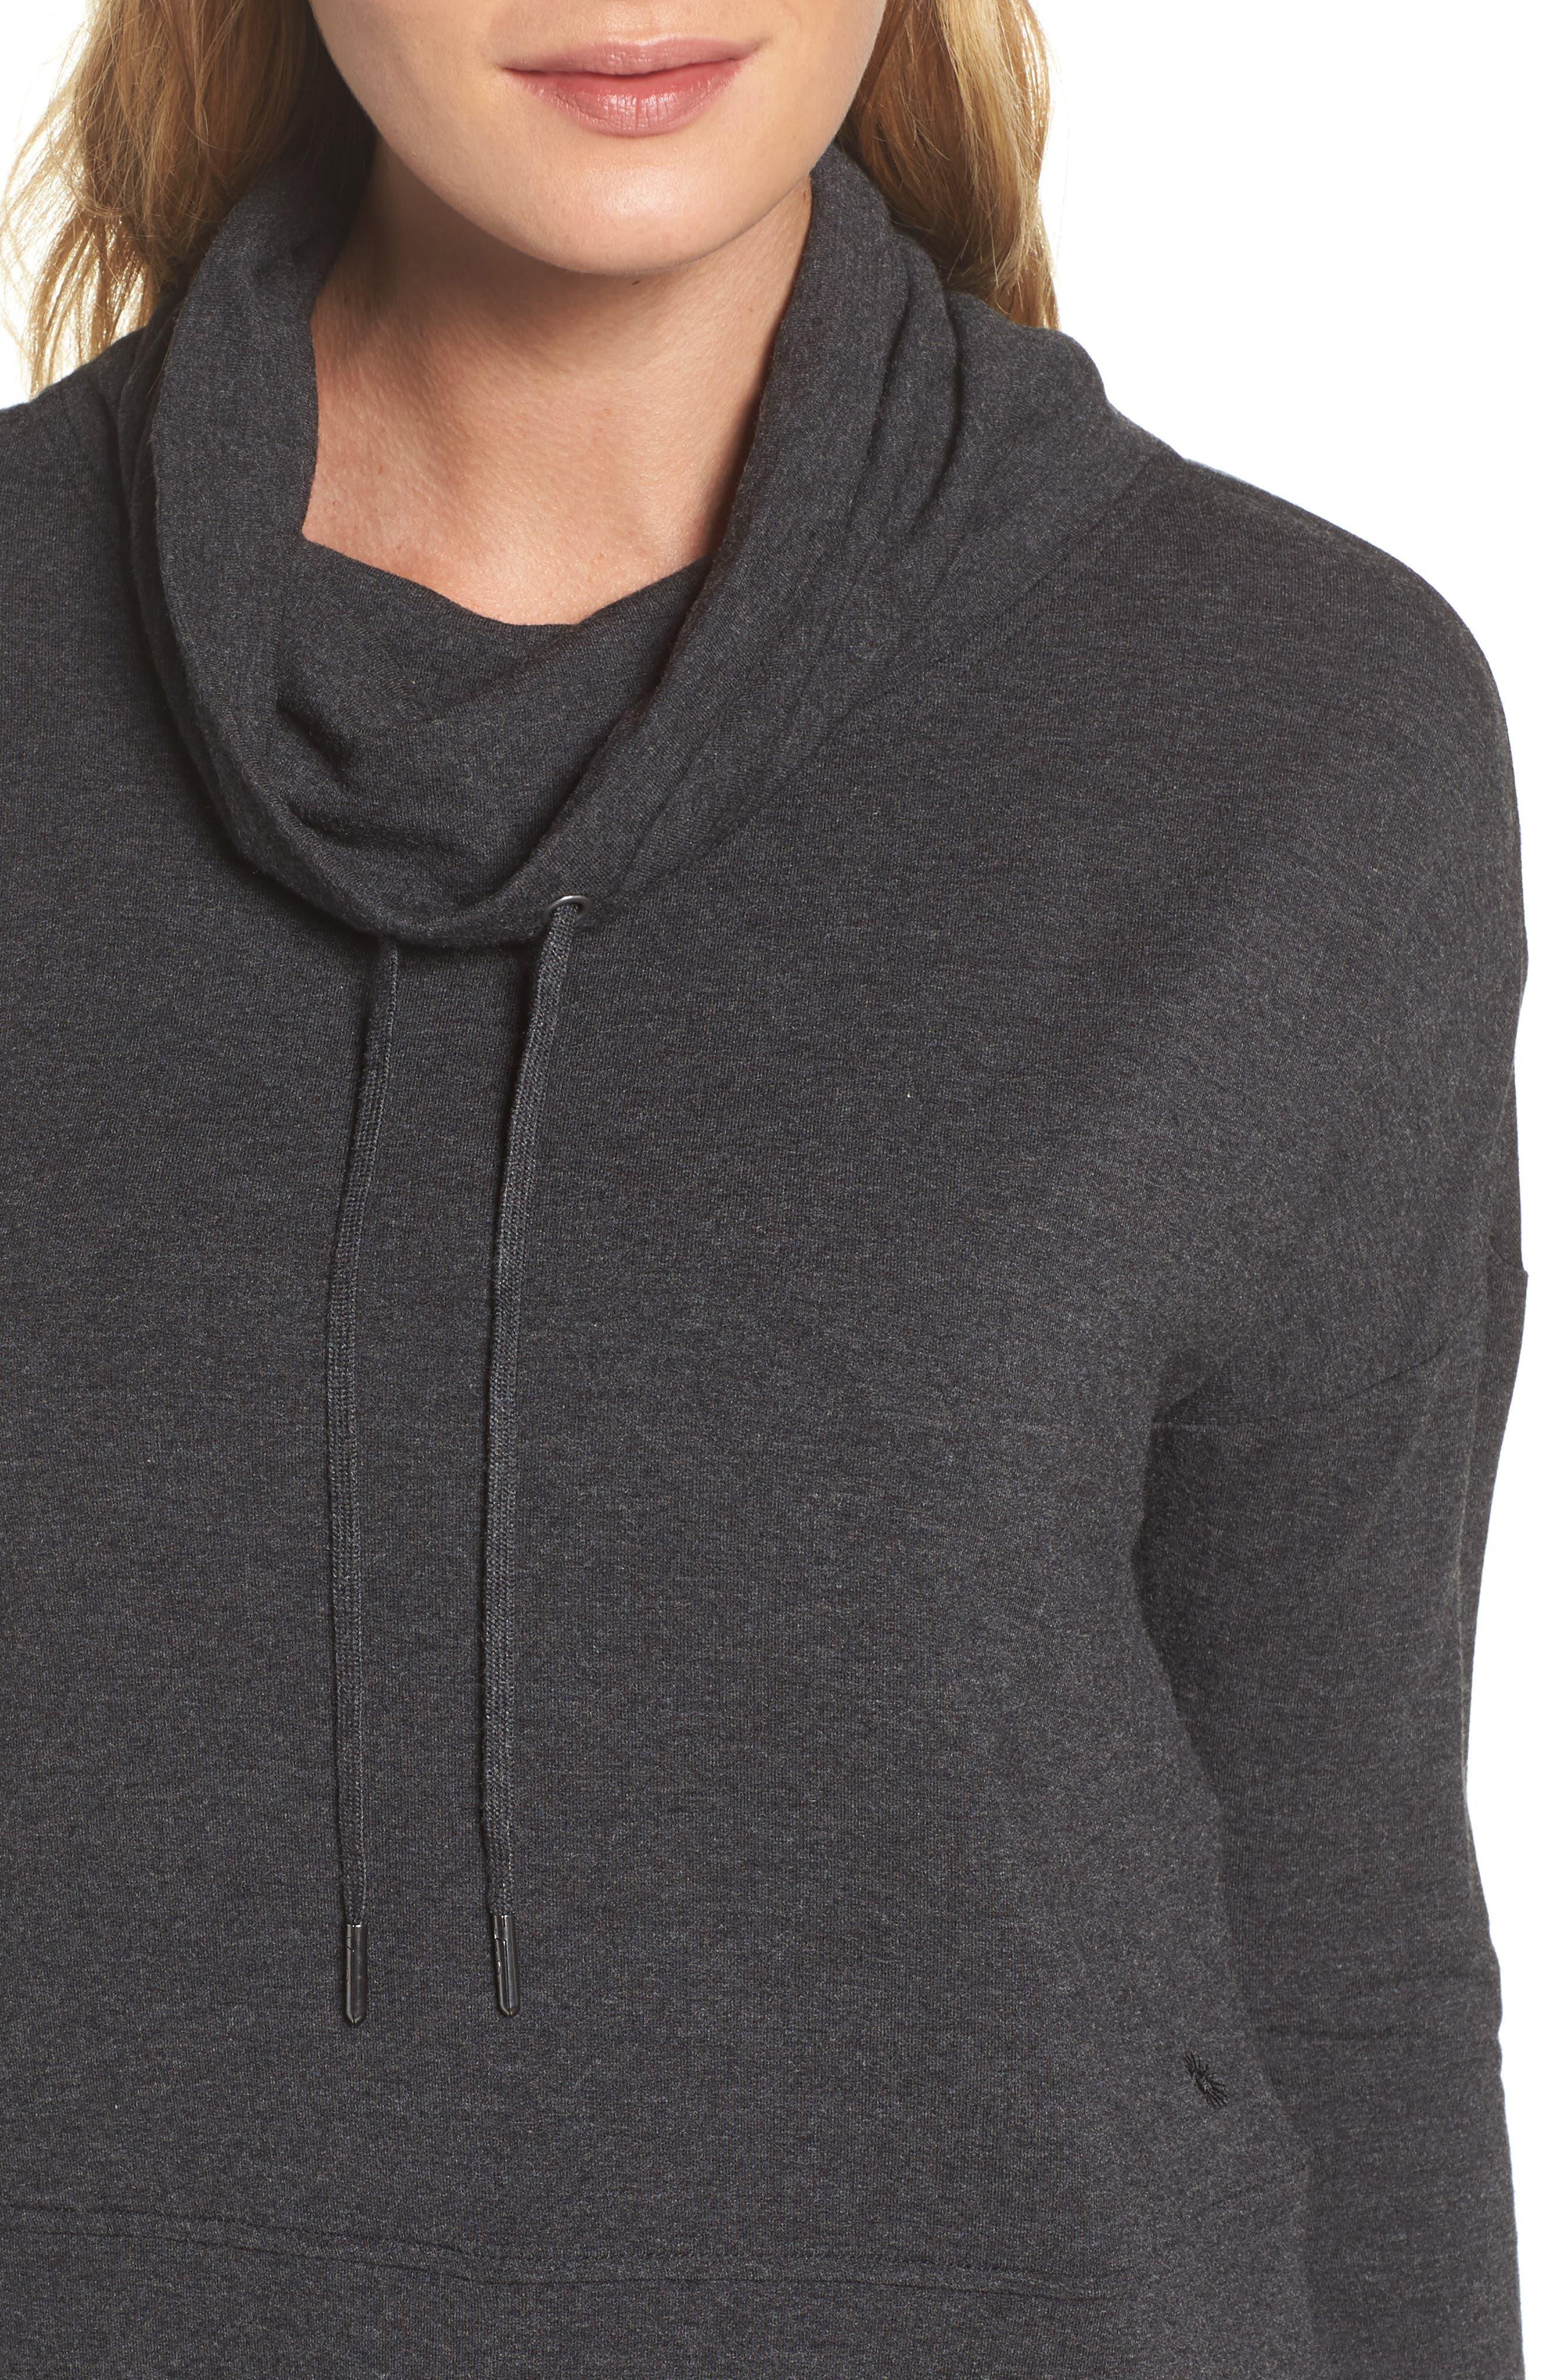 Funnel Neck Crop Sweatshirt,                             Alternate thumbnail 5, color,                             Black Heather